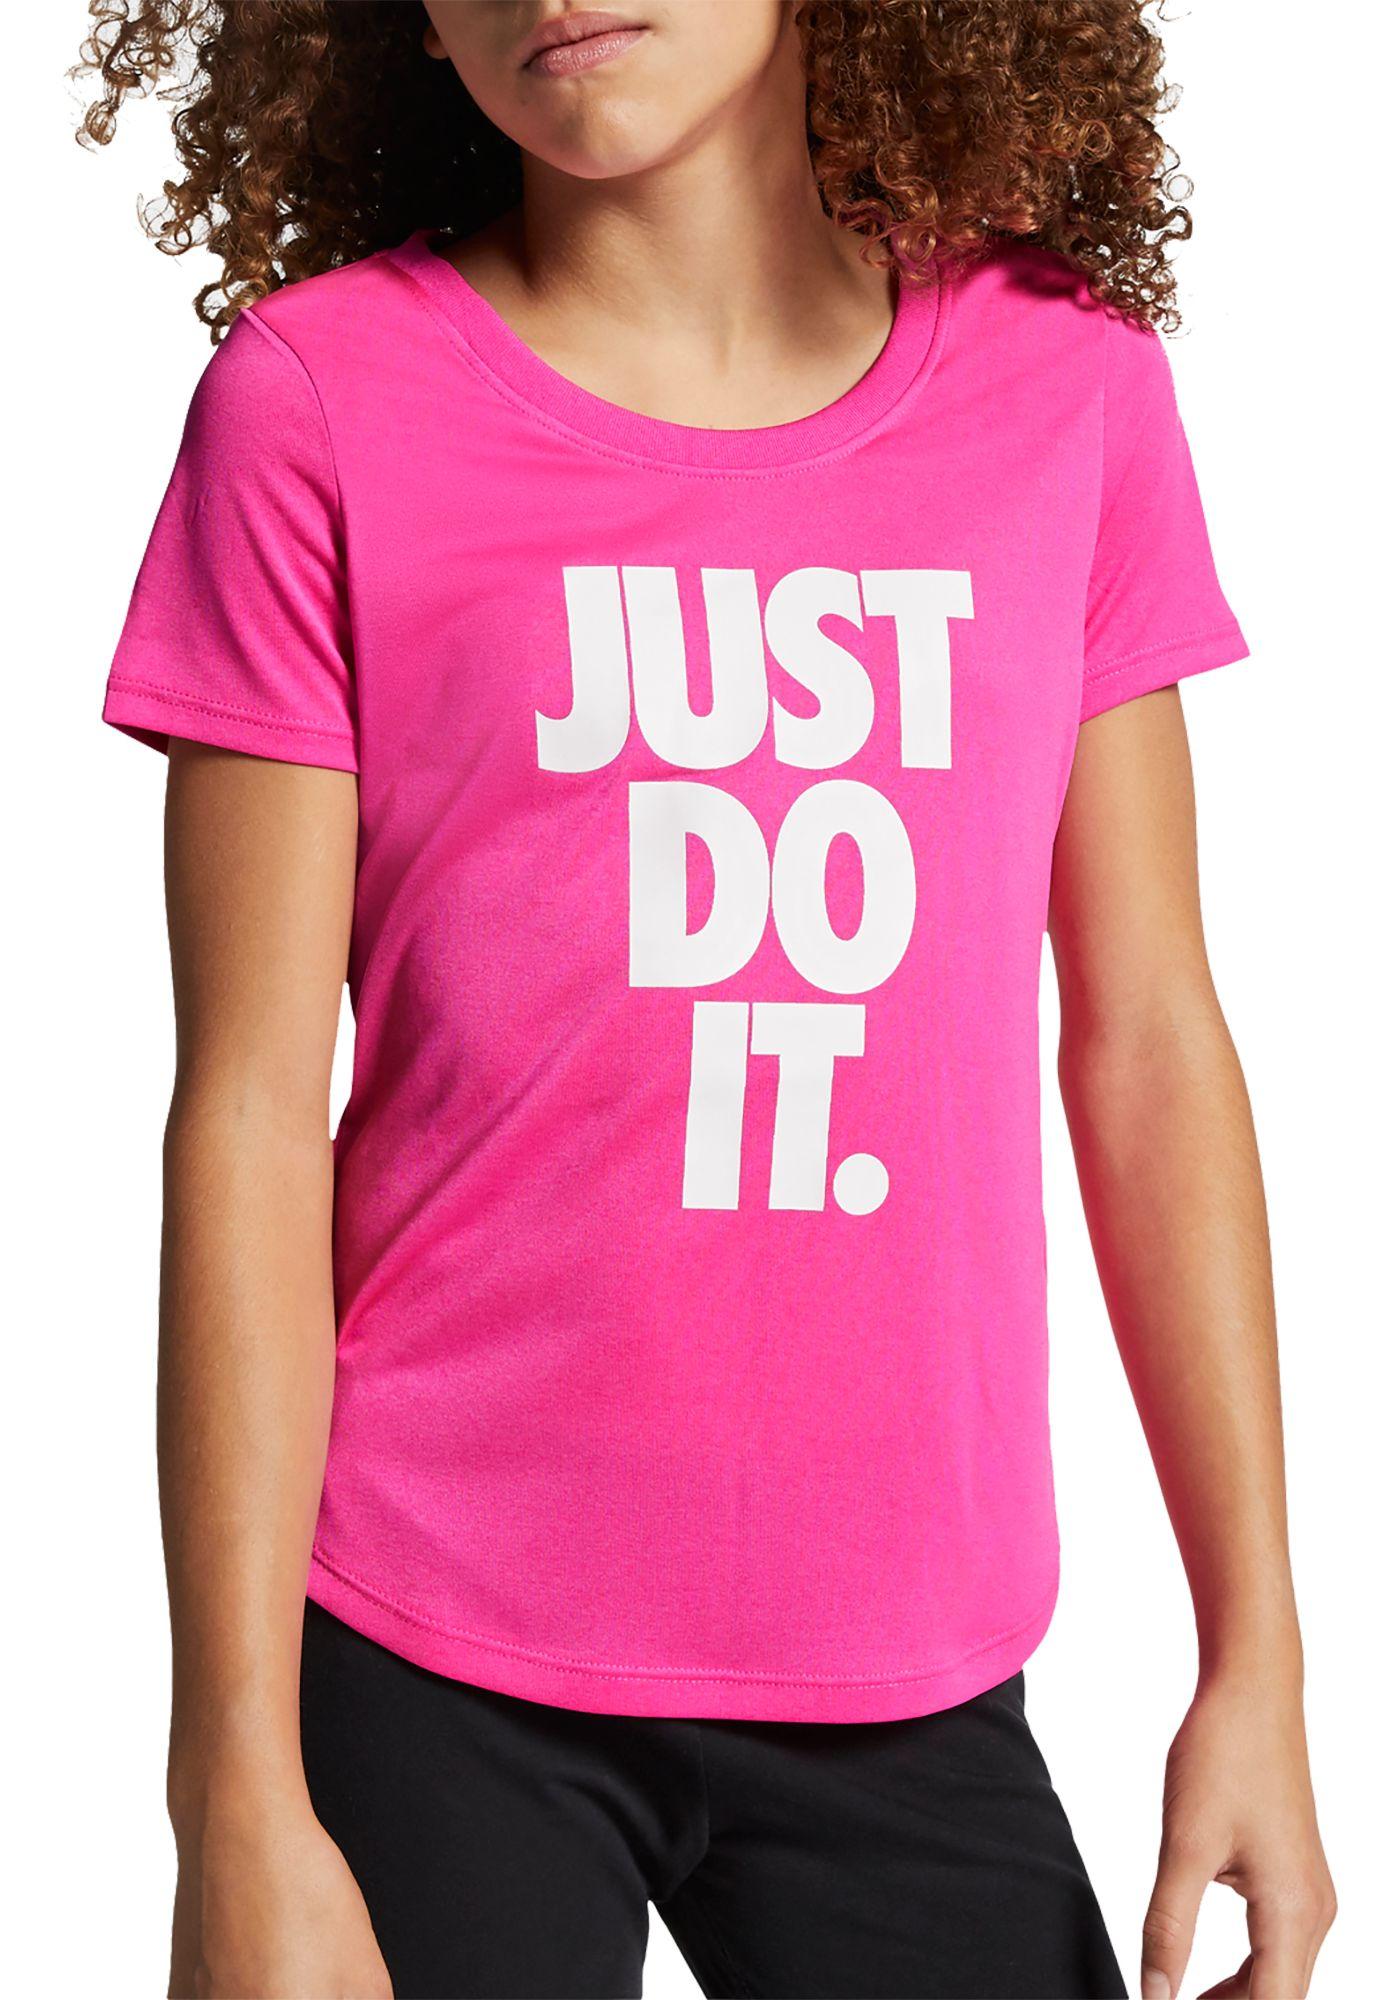 Nike Girls' Dri-FIT Just Do It Graphic T-Shirt